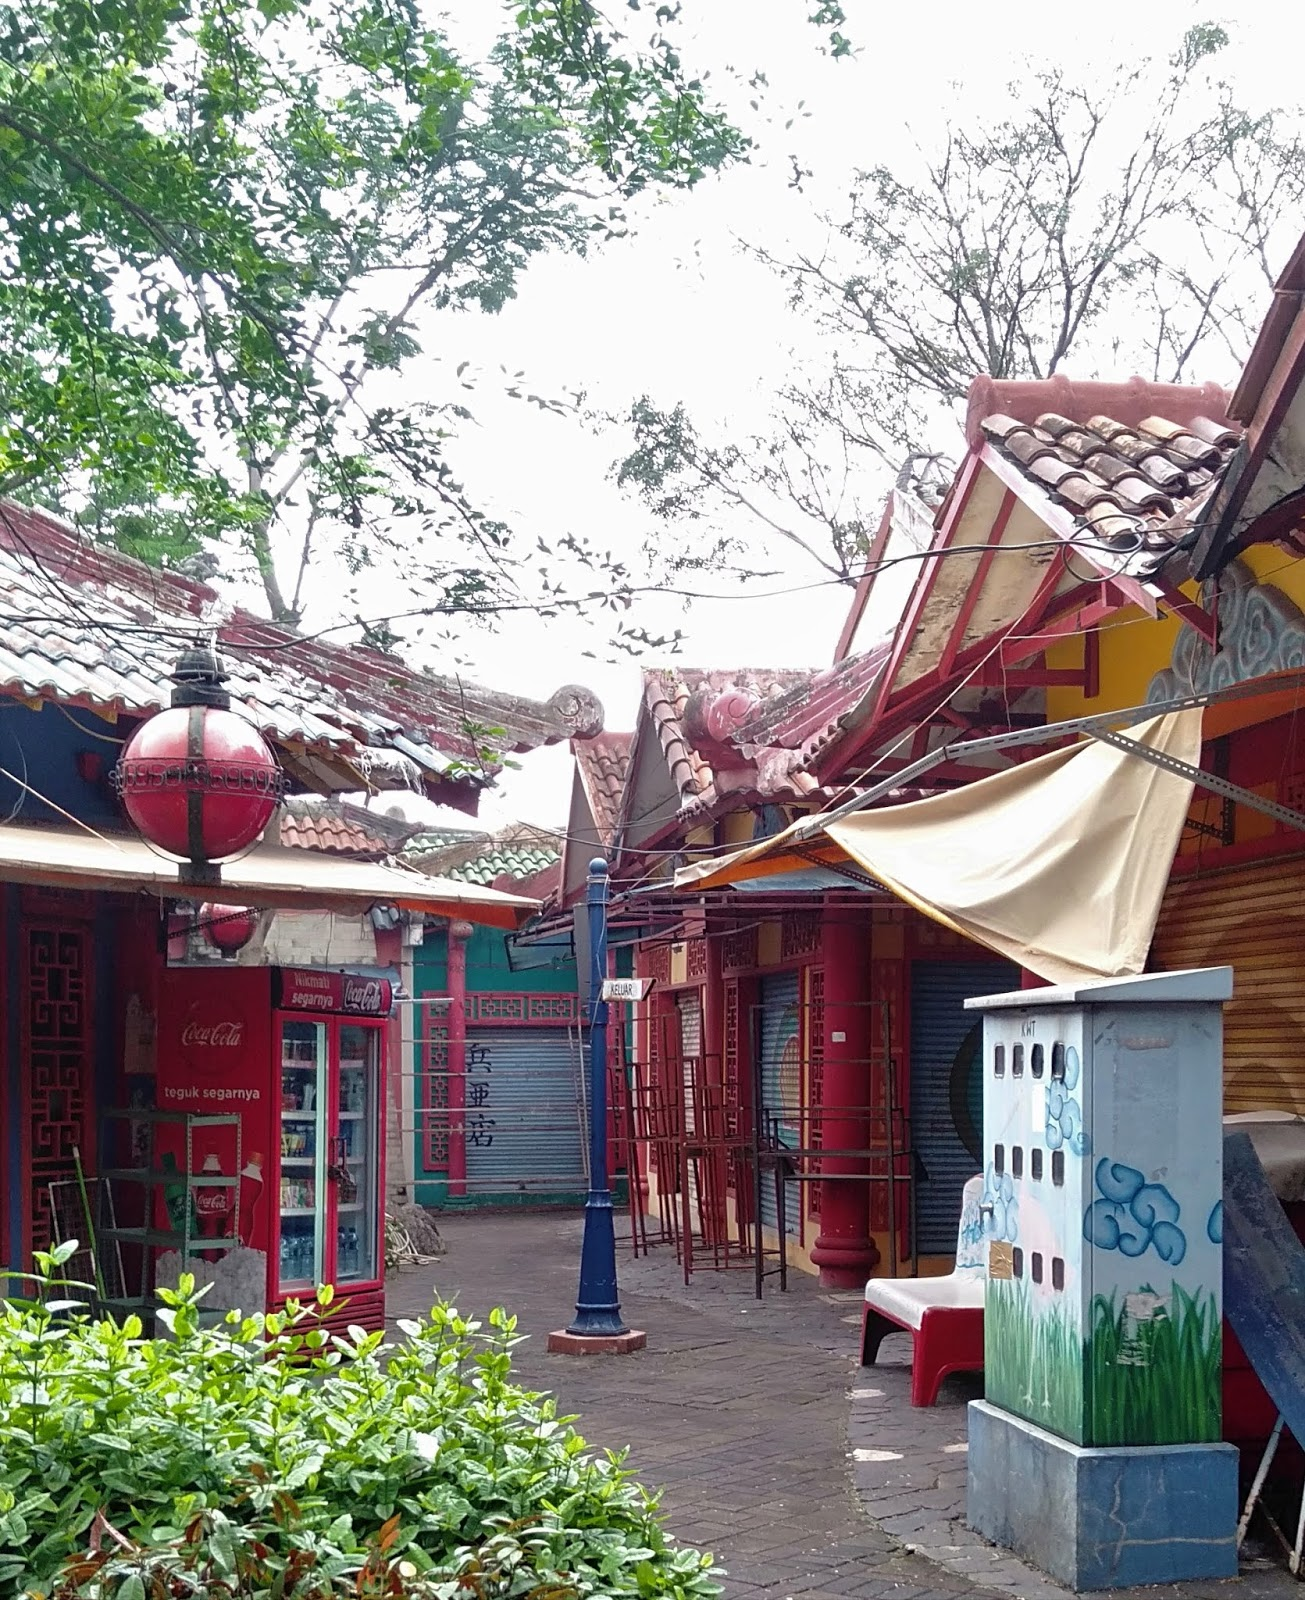 Kampung Cina Kota Wisata Cibubur, Riwayatmu Kini